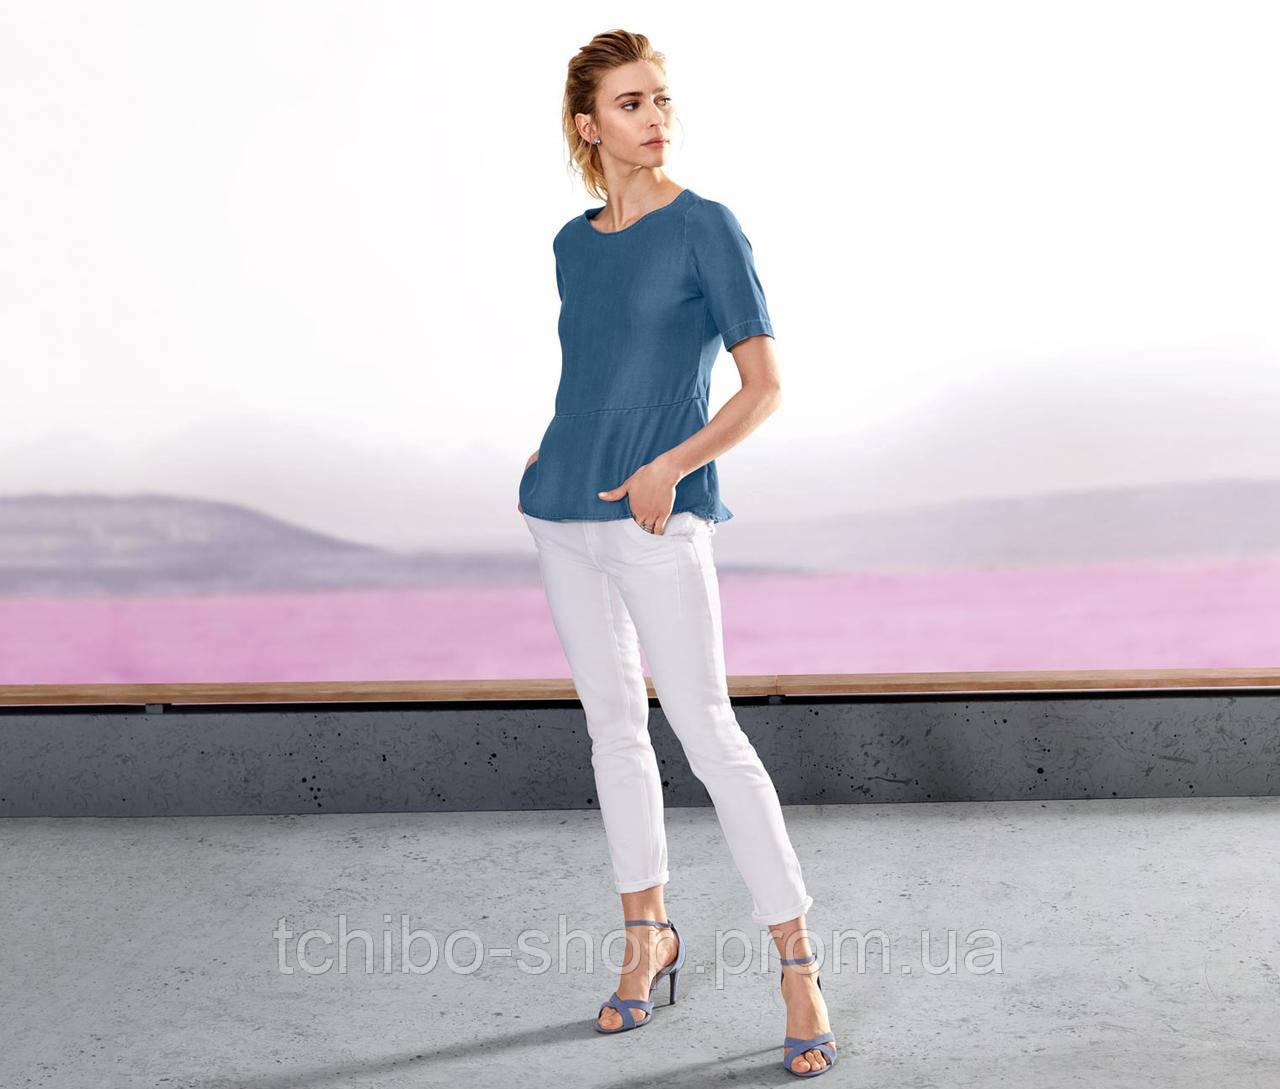 Стильная блуза тонкий джинс от тсм Tchibo размер 42 евро наш 48